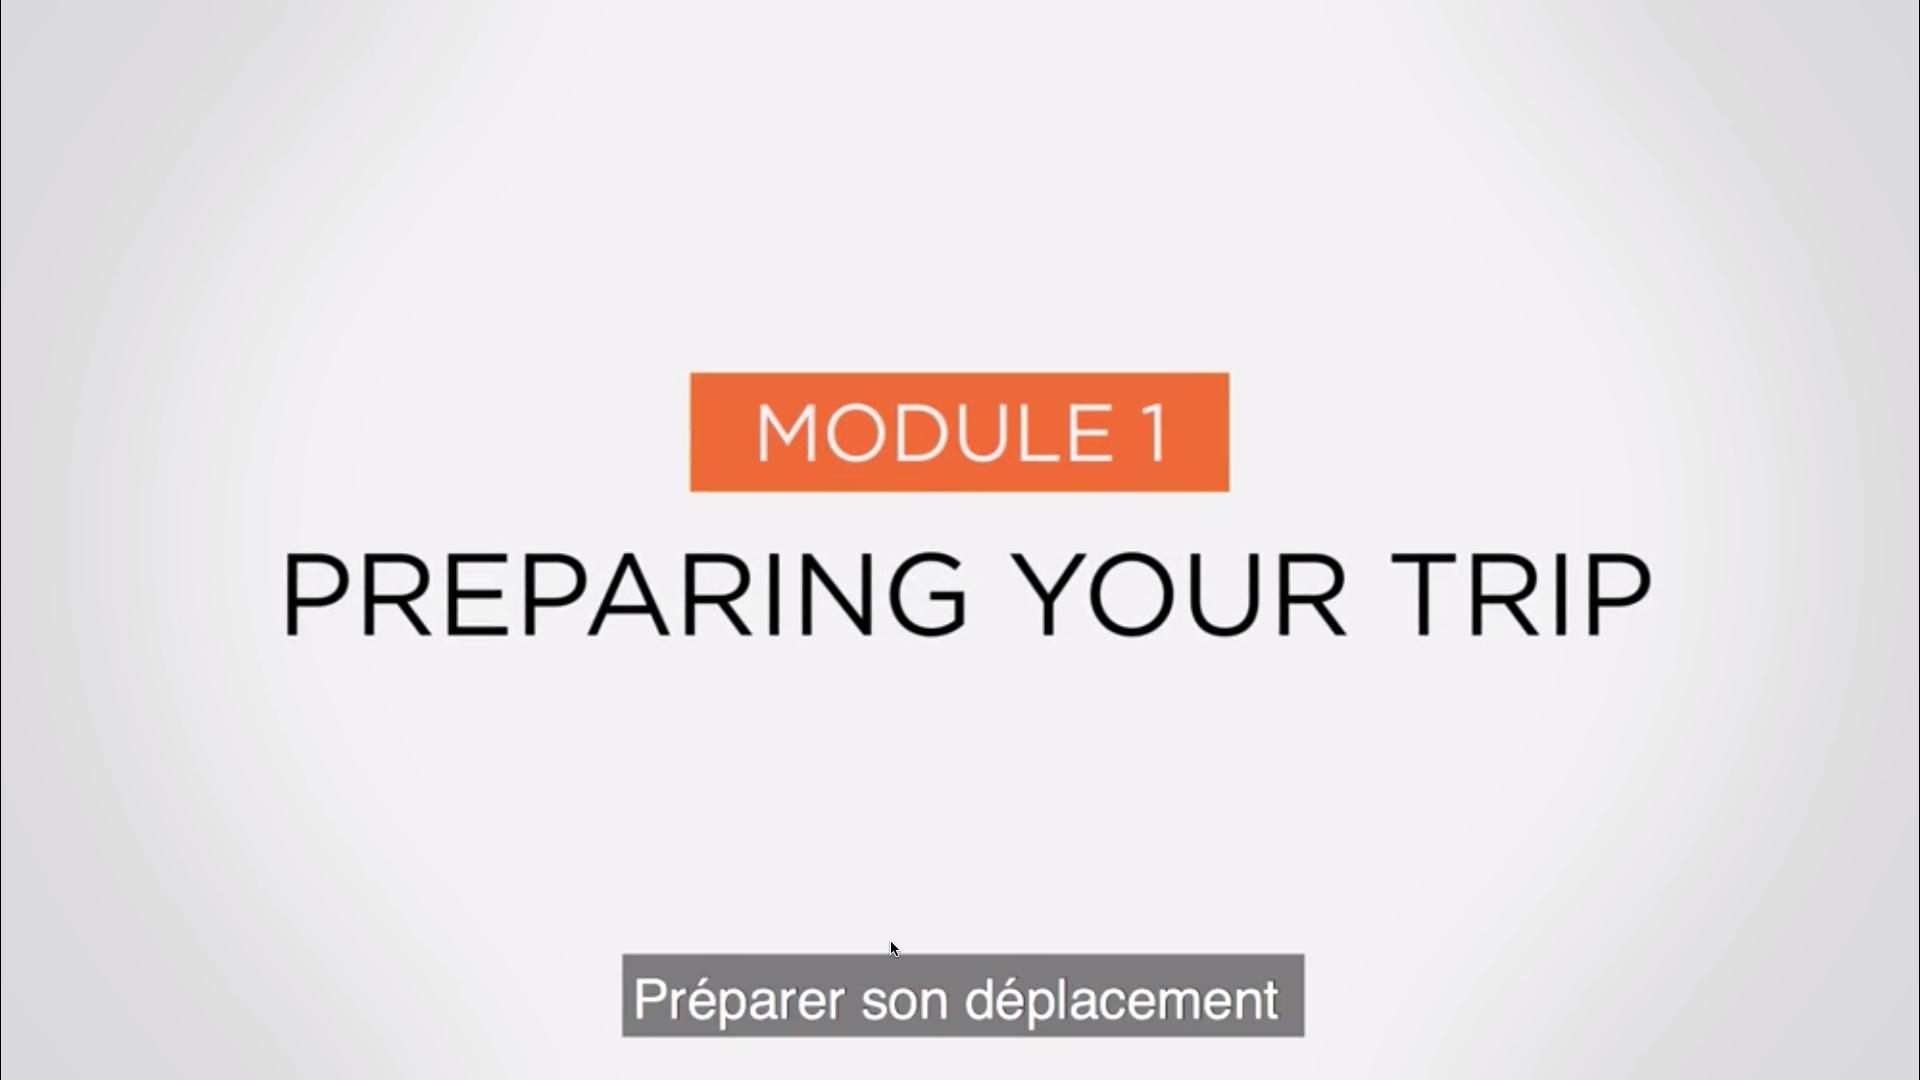 Module 1 - Preparing your trip